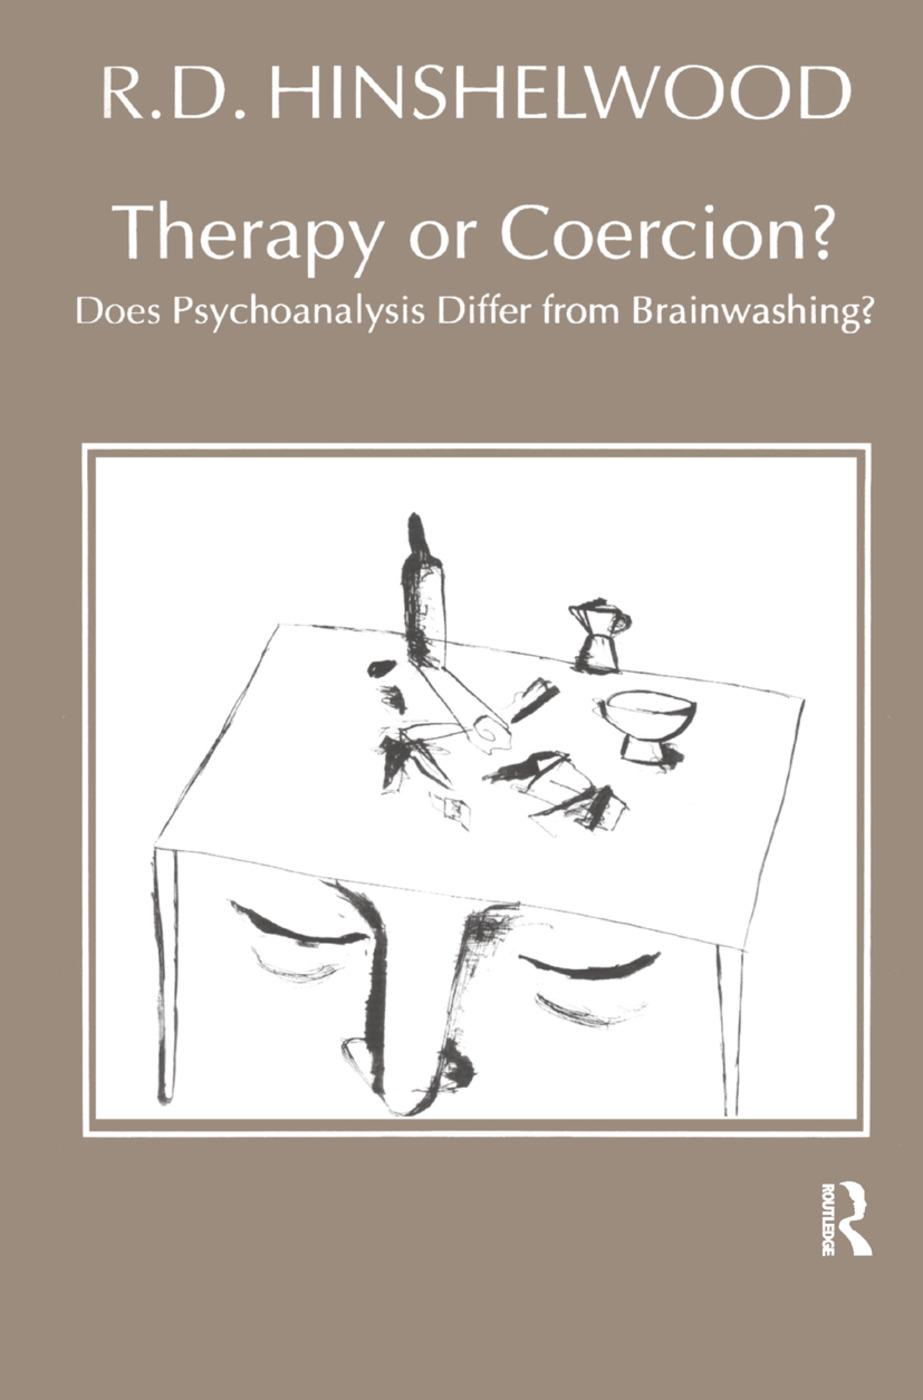 Coercion: induced splitting